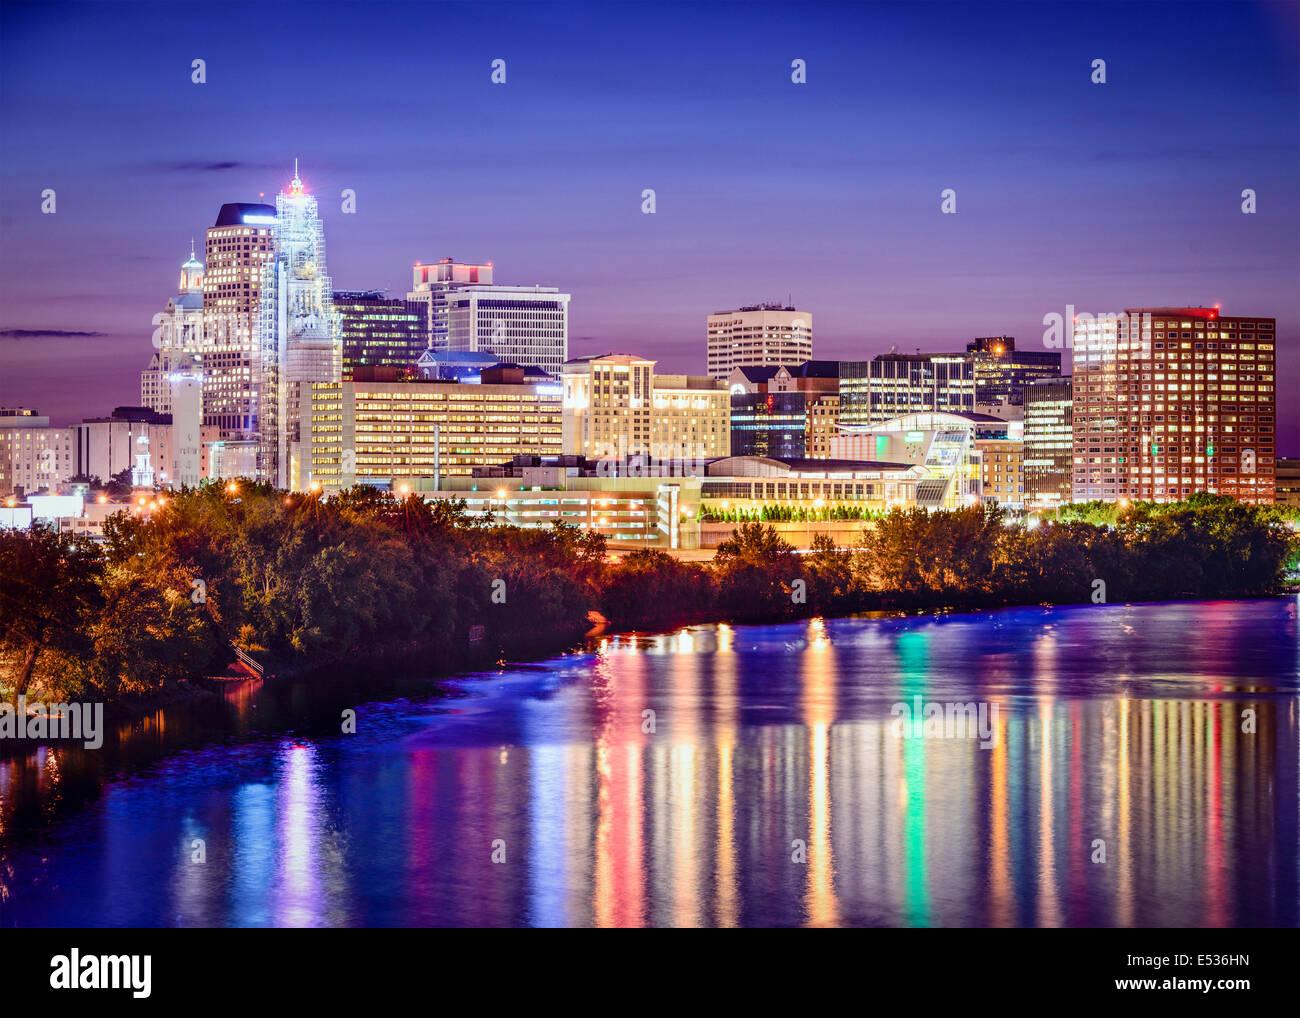 Hartford, Connecticut, USA skyline at twilight. - Stock Image